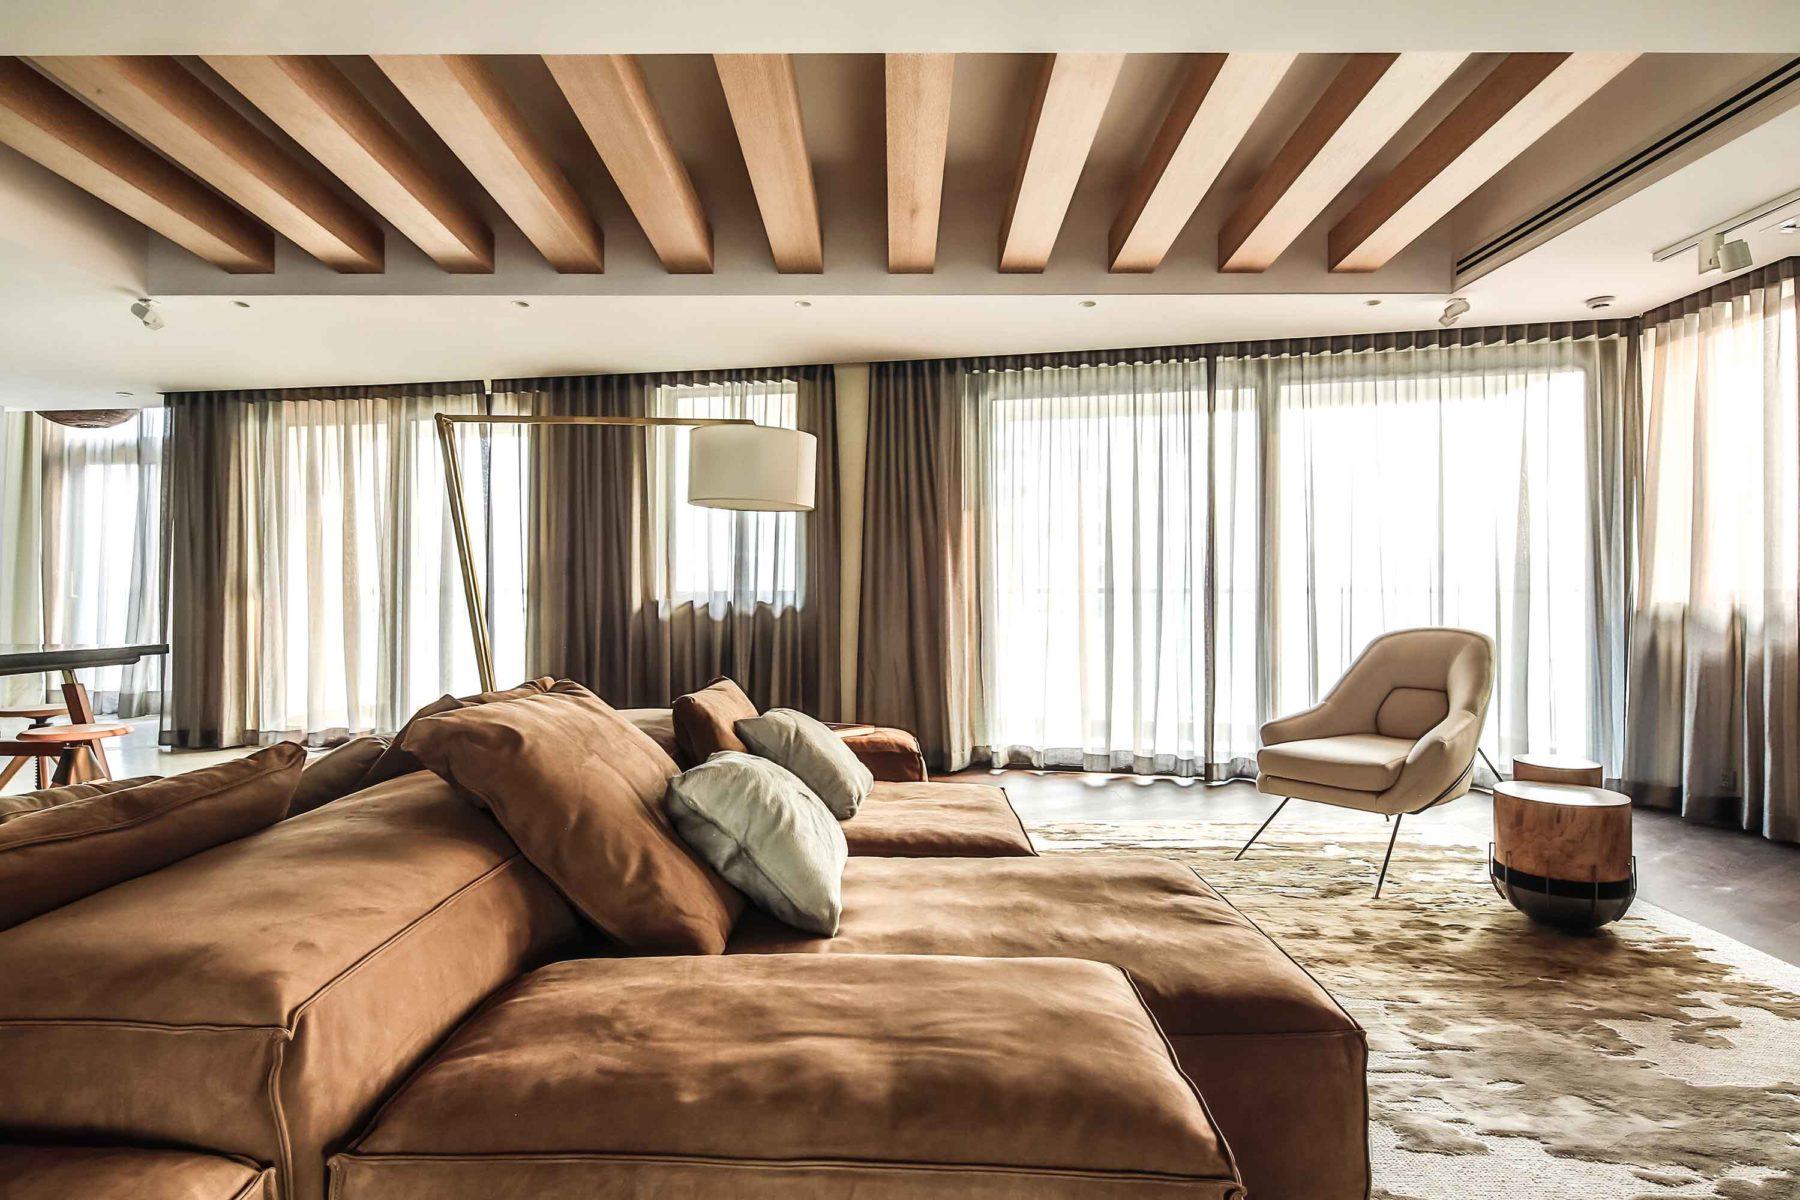 Hong Kong Interior Designers: Our Top 10 Modern Chairs hong kong interior designers Hong Kong Interior Designers: Our Top 10 Modern Chairs Hong Kong Interior Designers Our Top 10 Modern Chairs 8